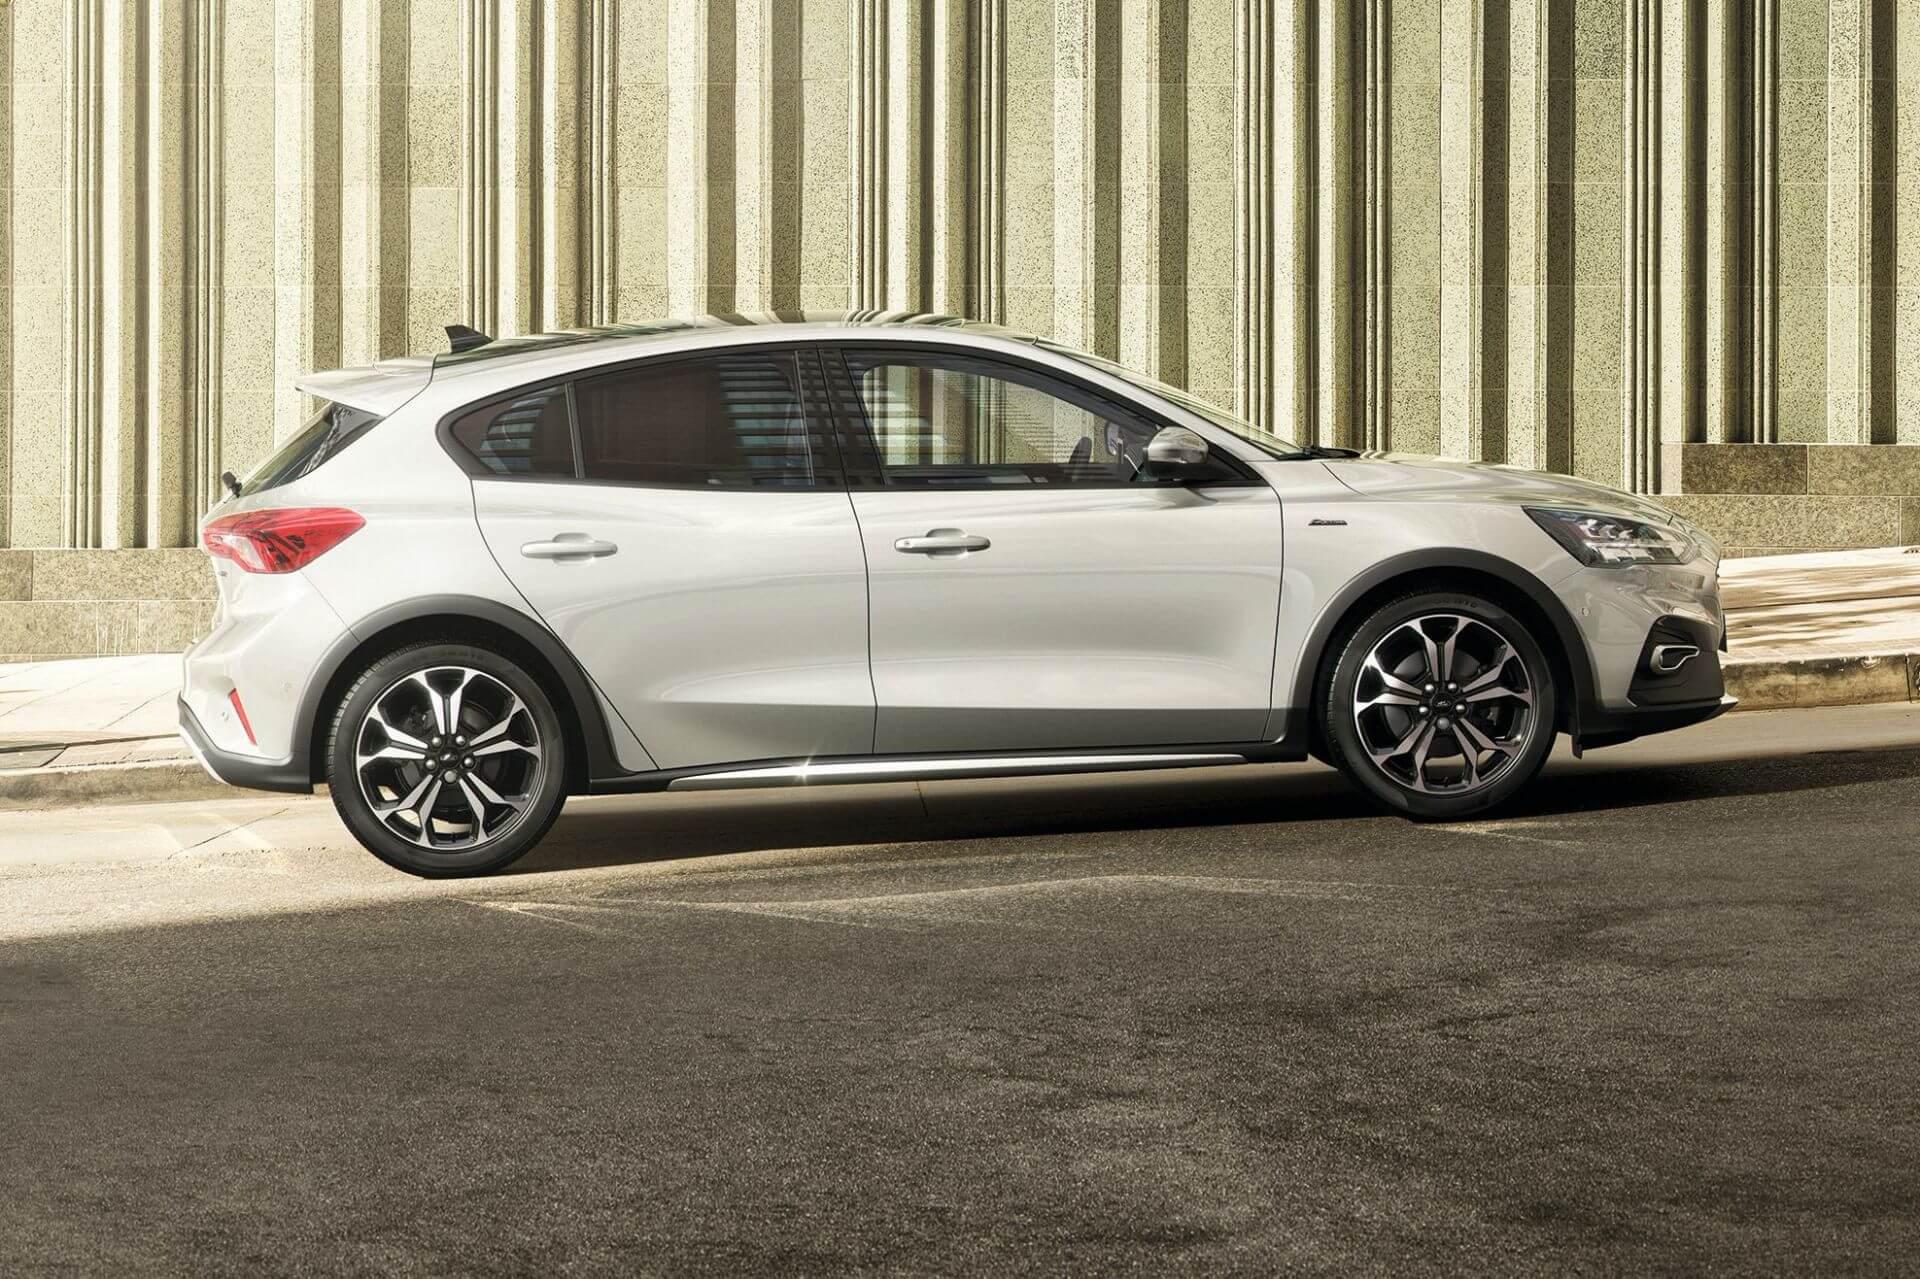 Ford Focus mild-hybrid